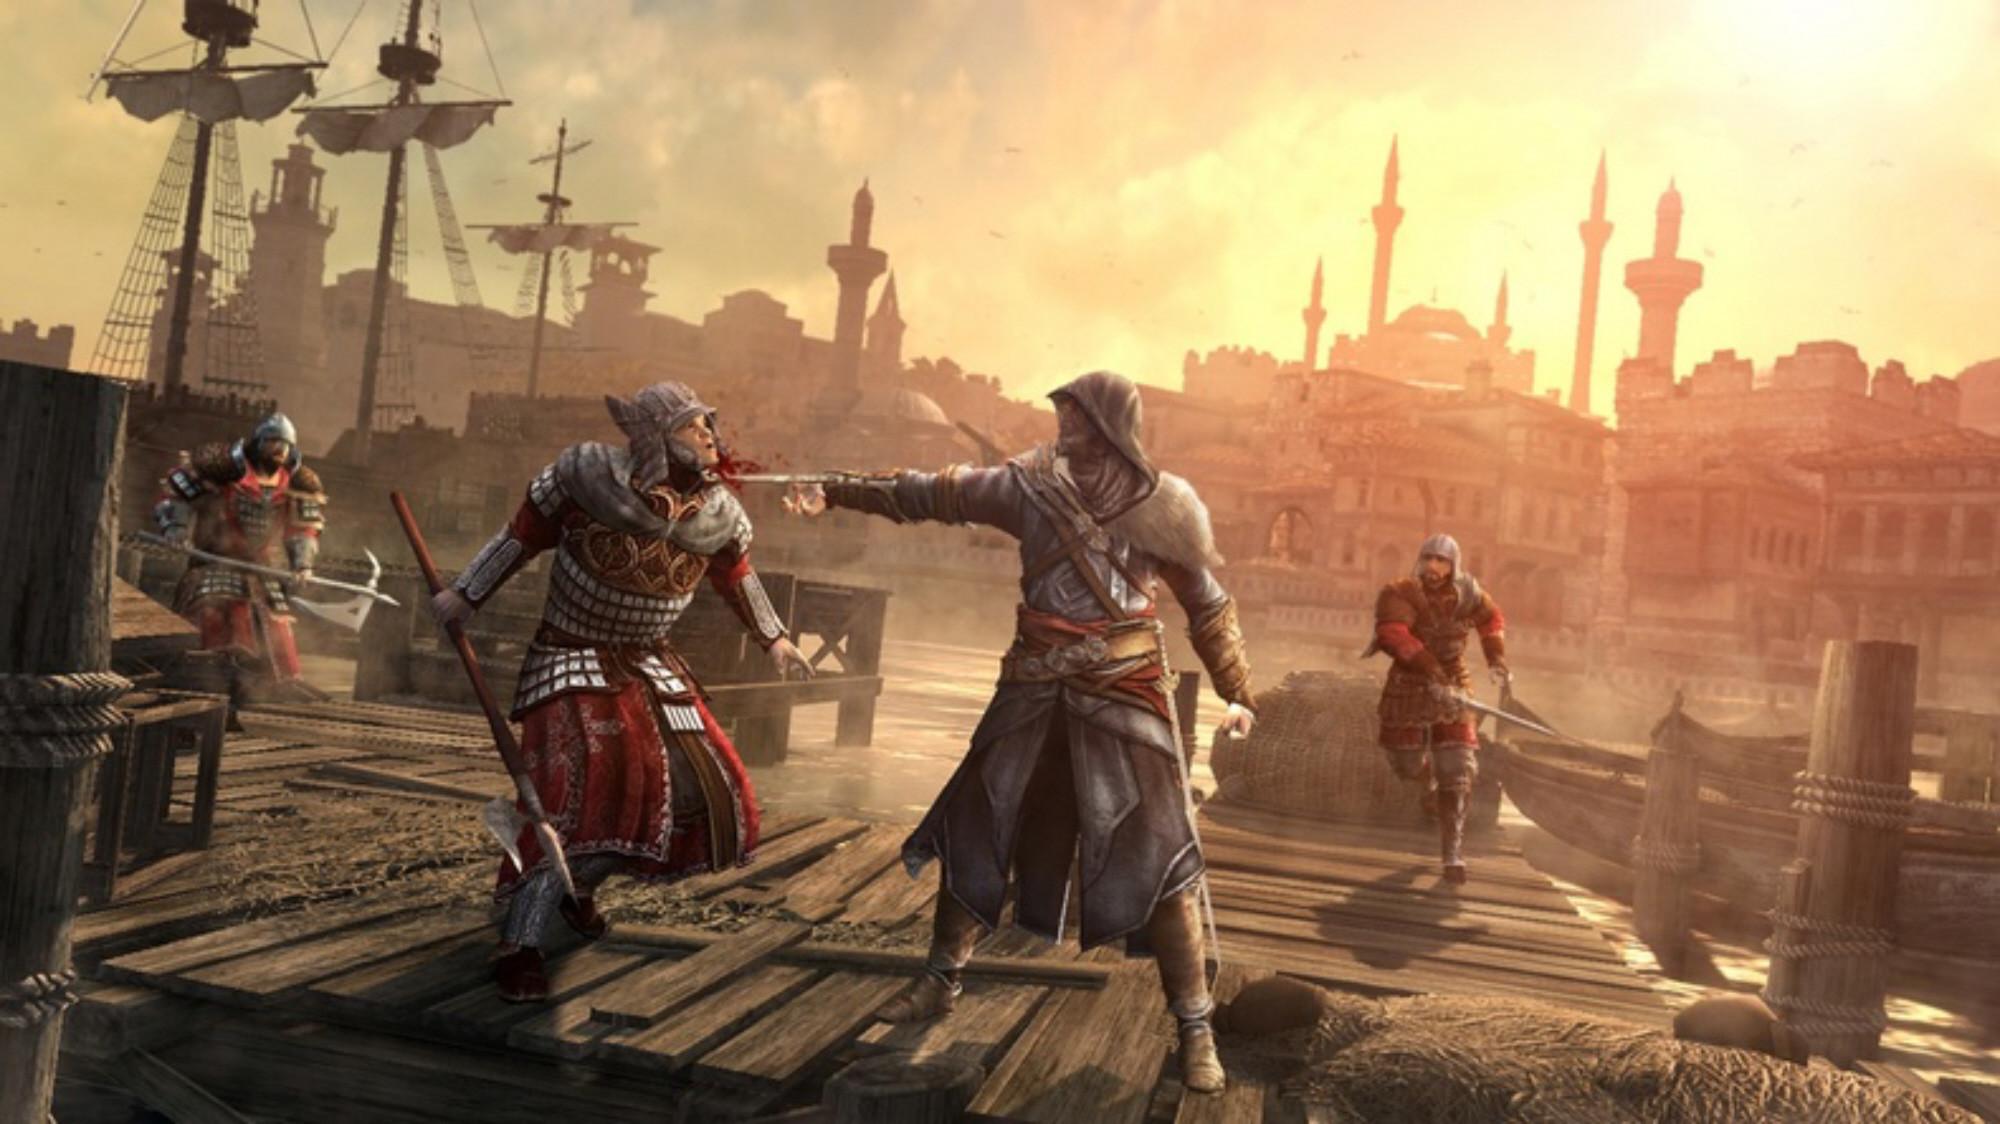 Download Assassin's Creed Revelations Wallpaper